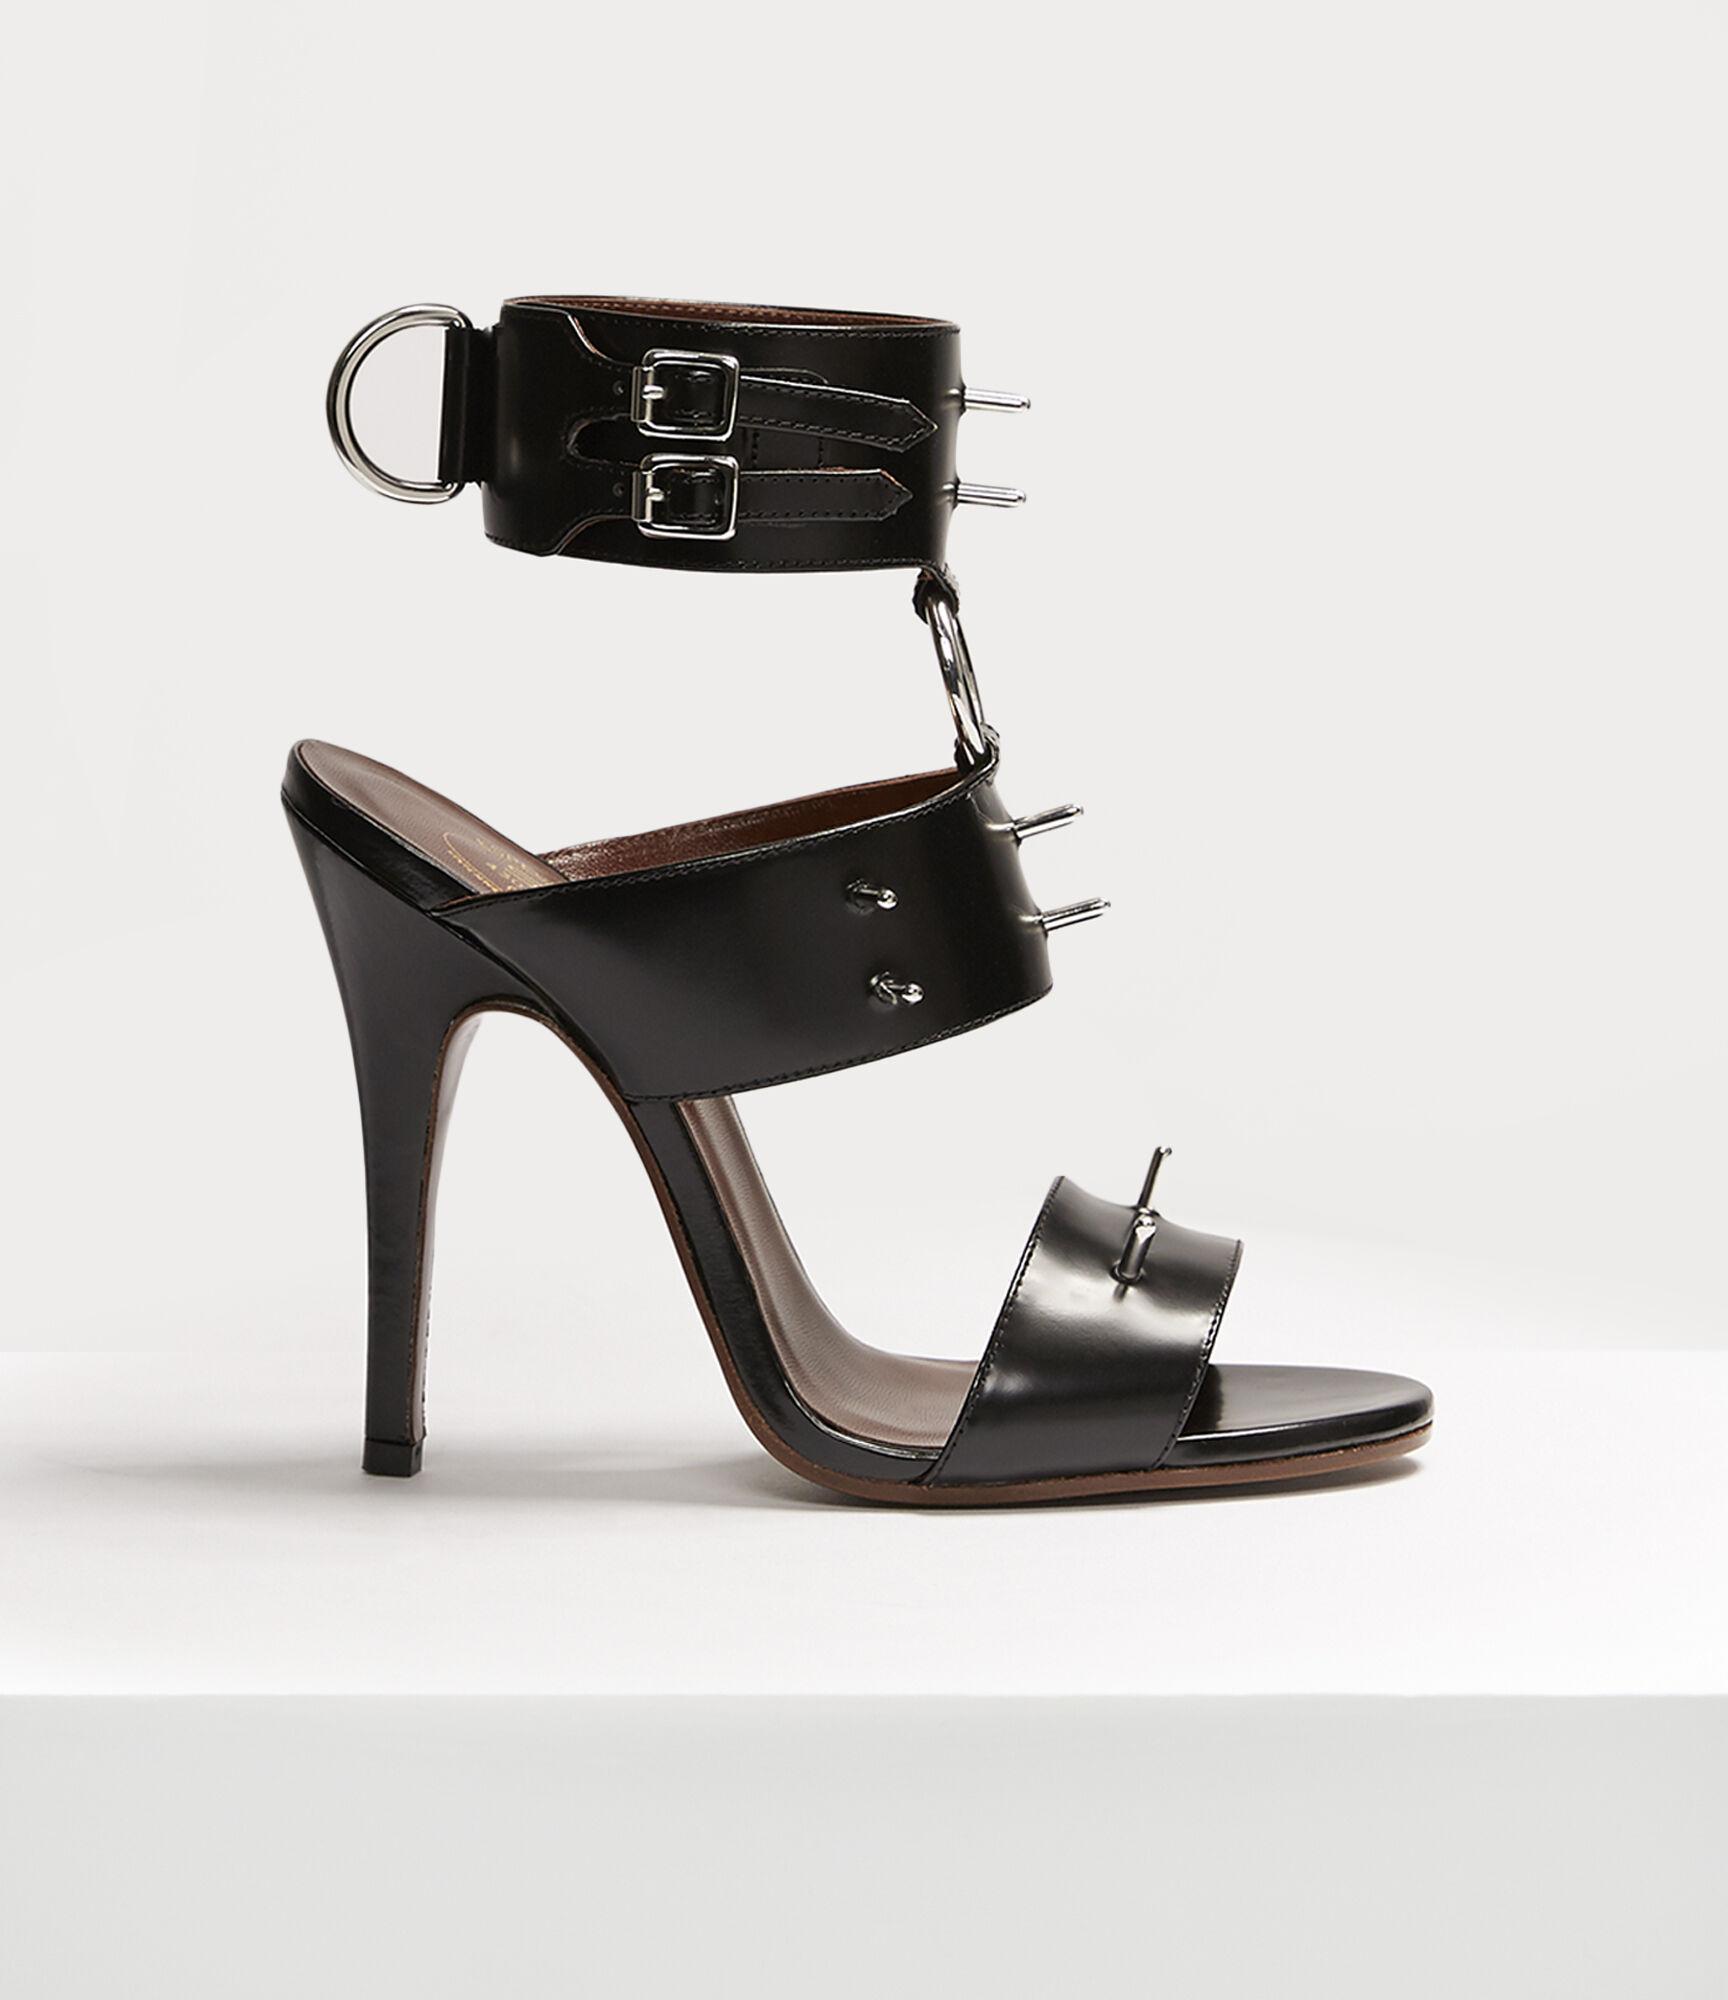 Vivienne Westwood Sandals | Women's